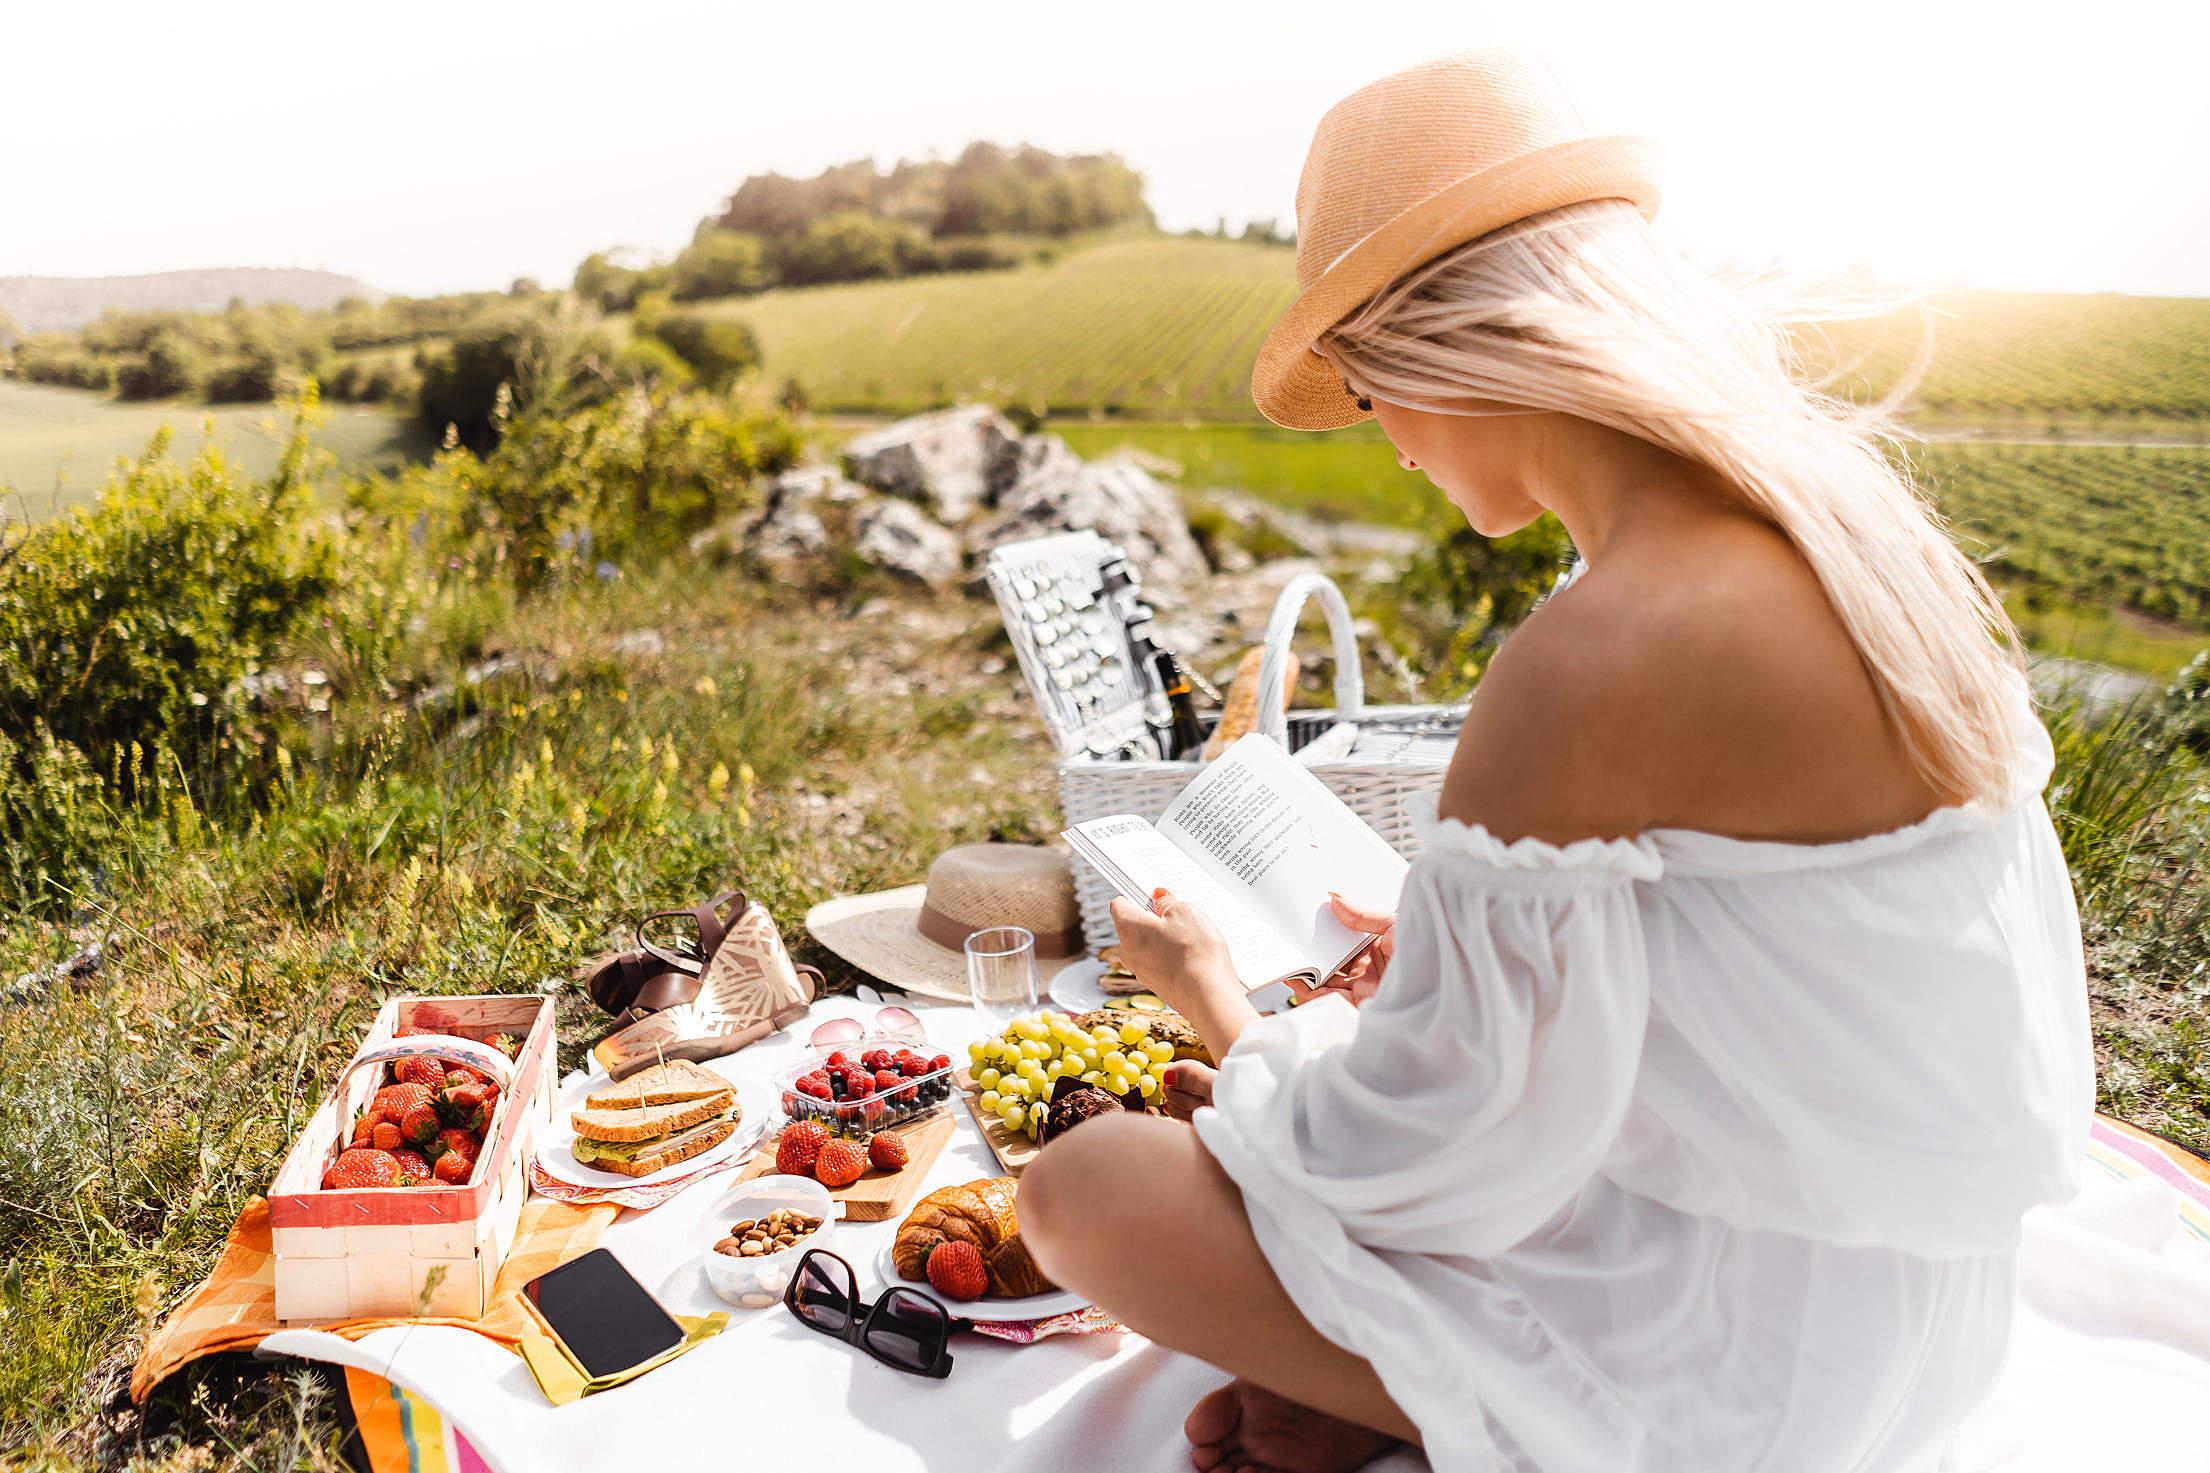 Girl Reading at a Picnic Free Stock Photo